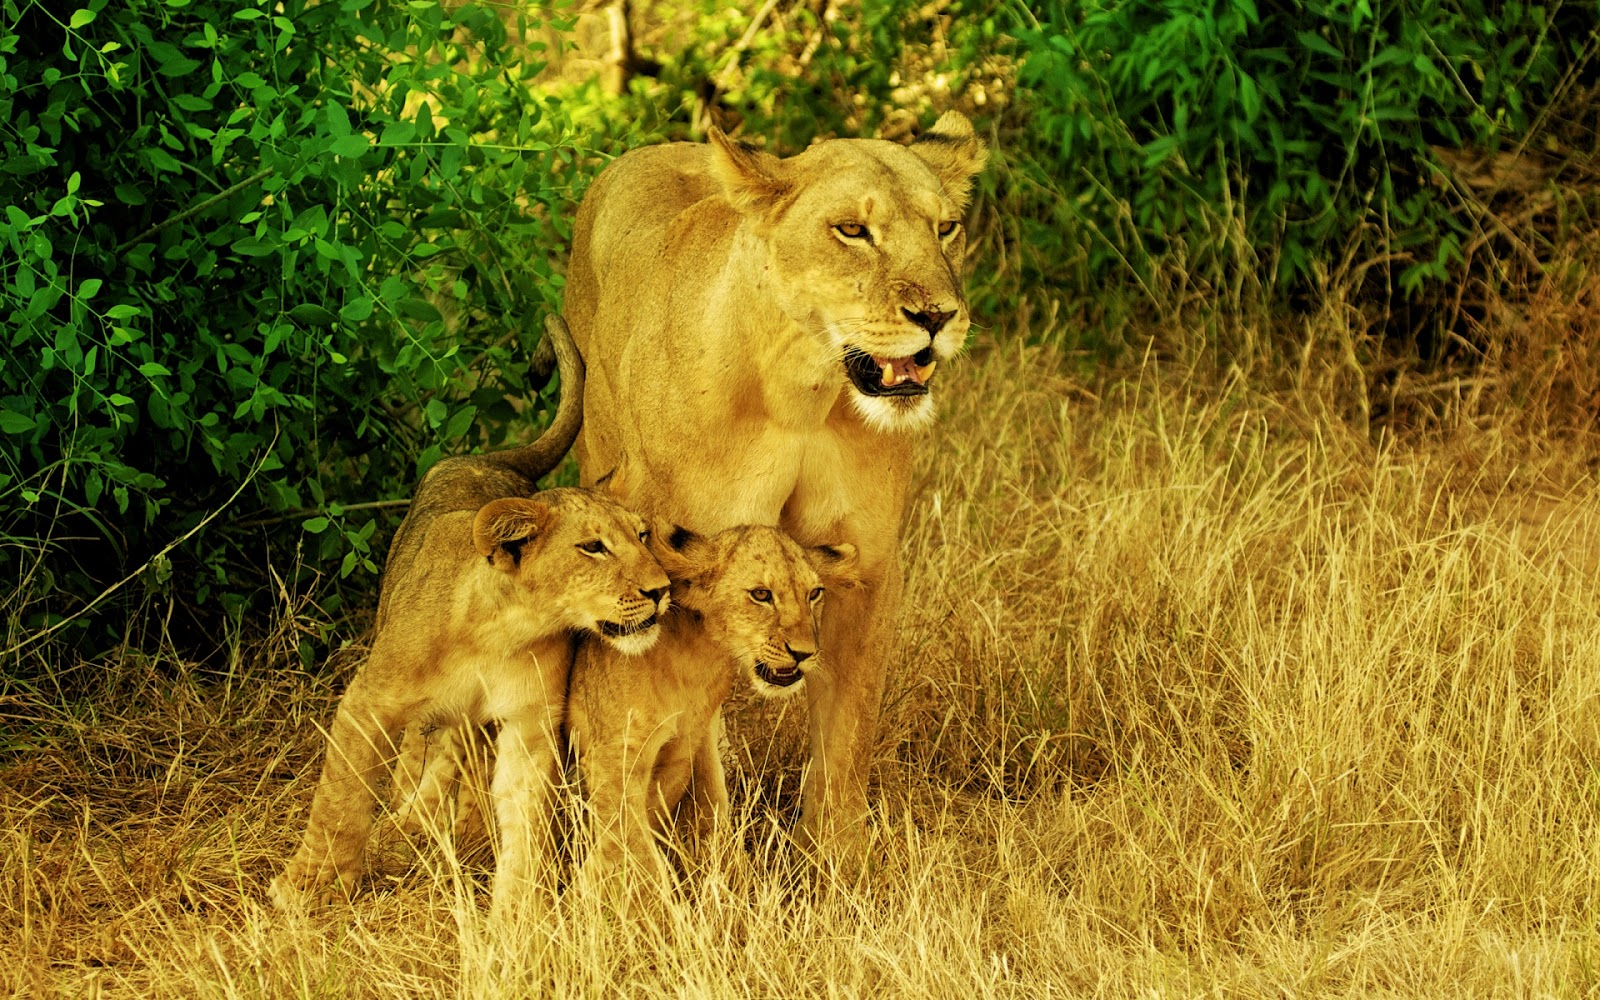 Africas Lions Family Full HD Desktop Wallpapers 1080p 1600x1000